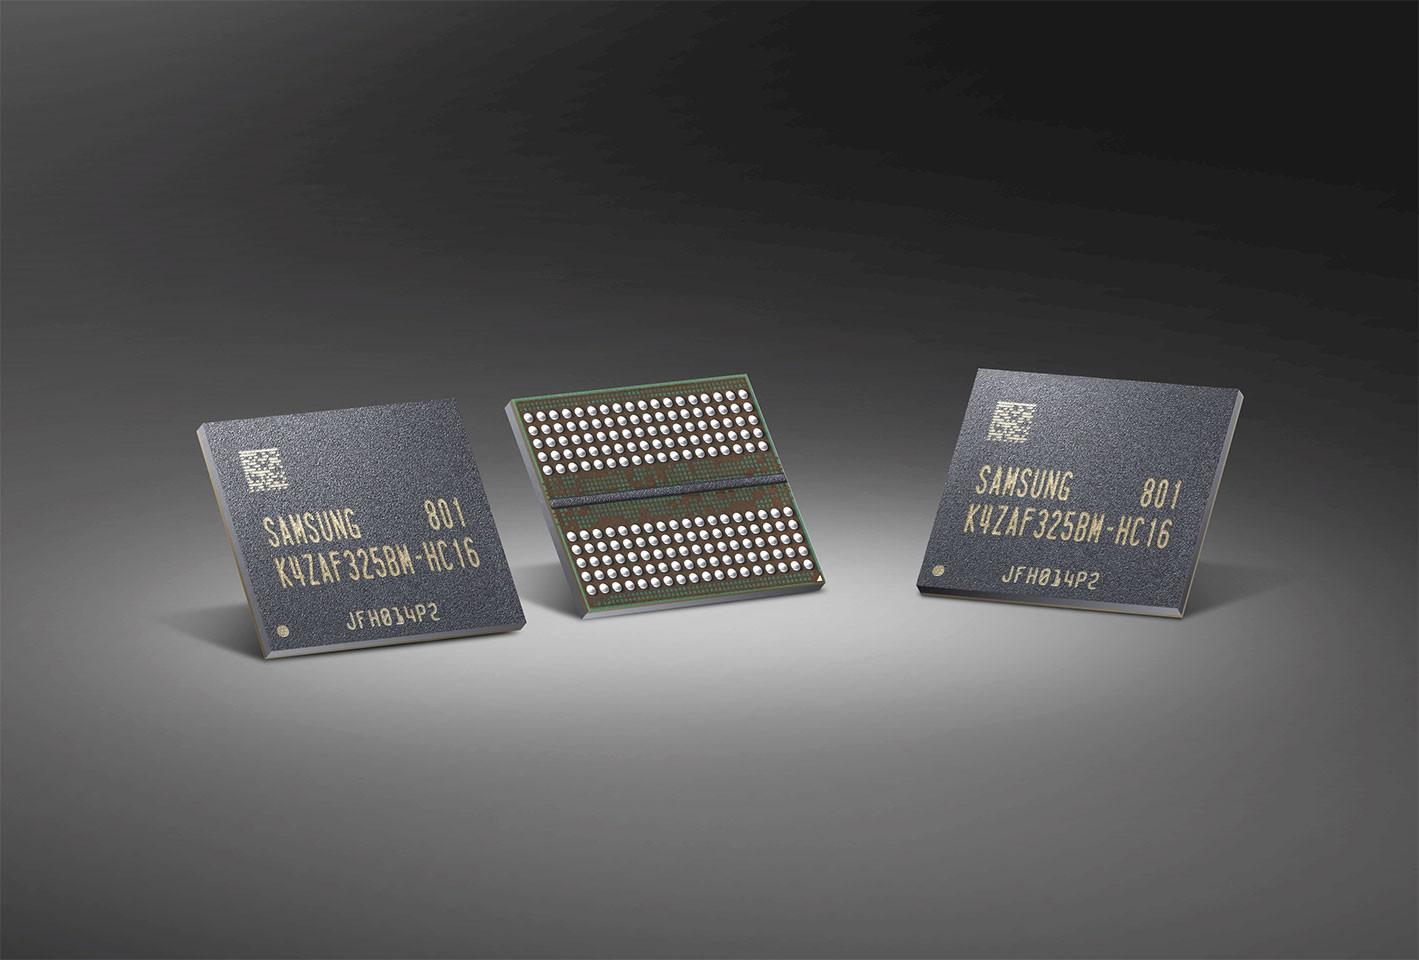 Samsung ya produce su GDDR6 a 18 Gbps